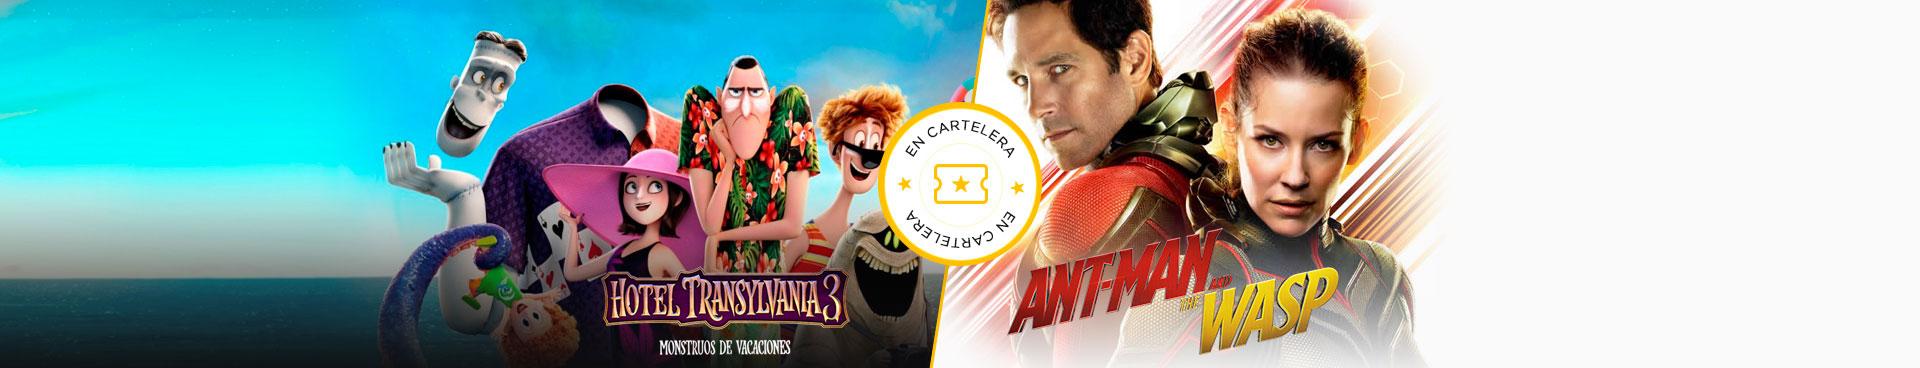 En cartelera Hotel Transilvania + Ant-man